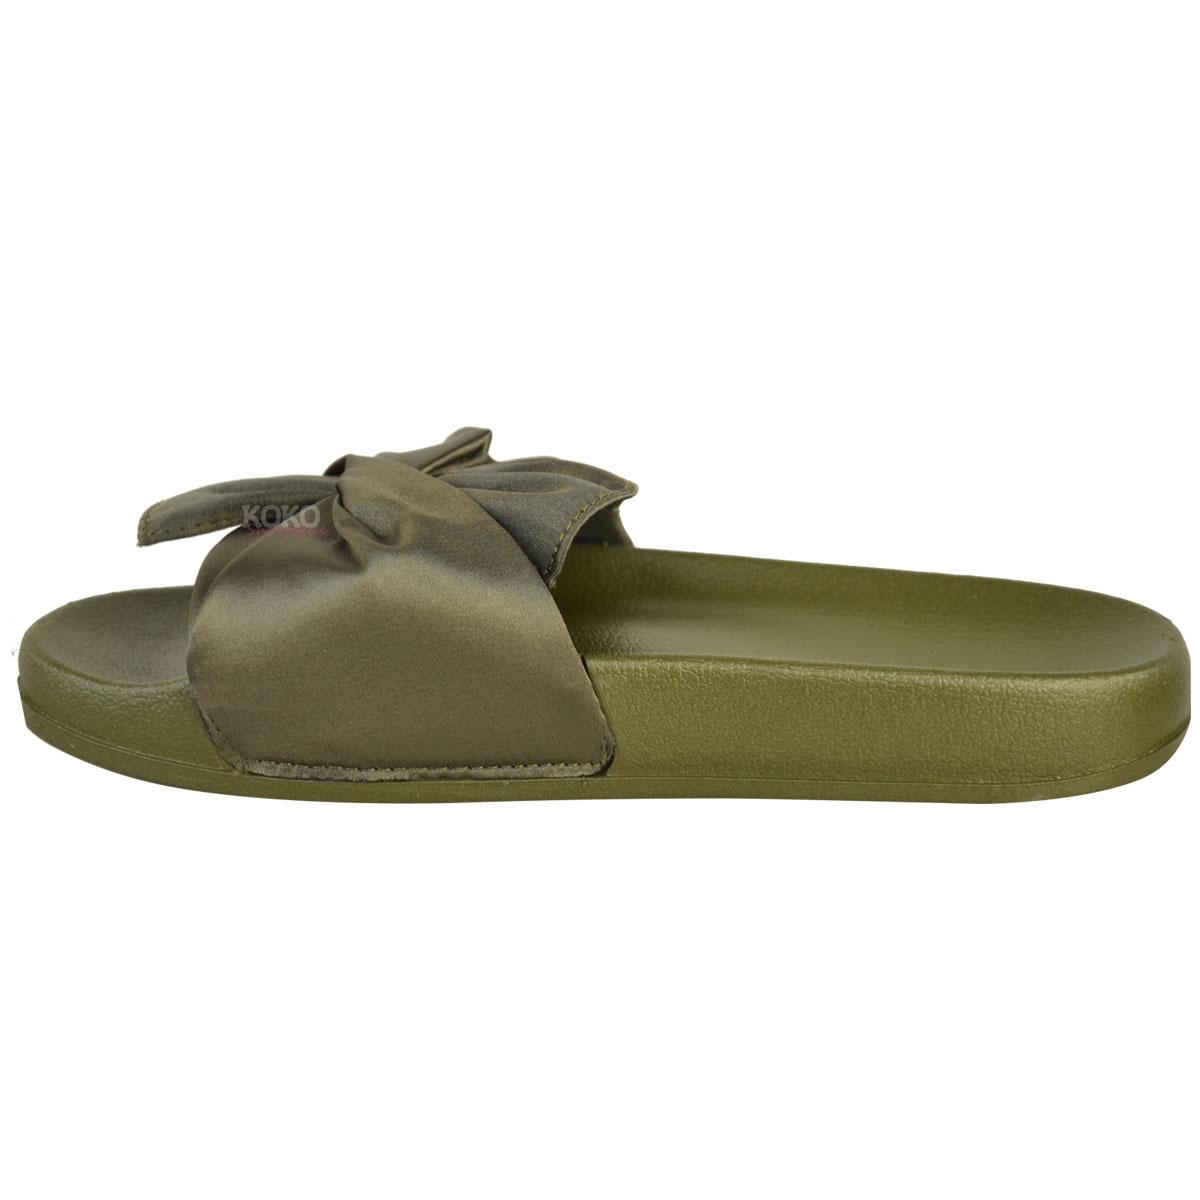 Mujer señoras cómoda Pisos De Goma Arco deslizadores Casual Pantuflas Zapatos Raso Talla